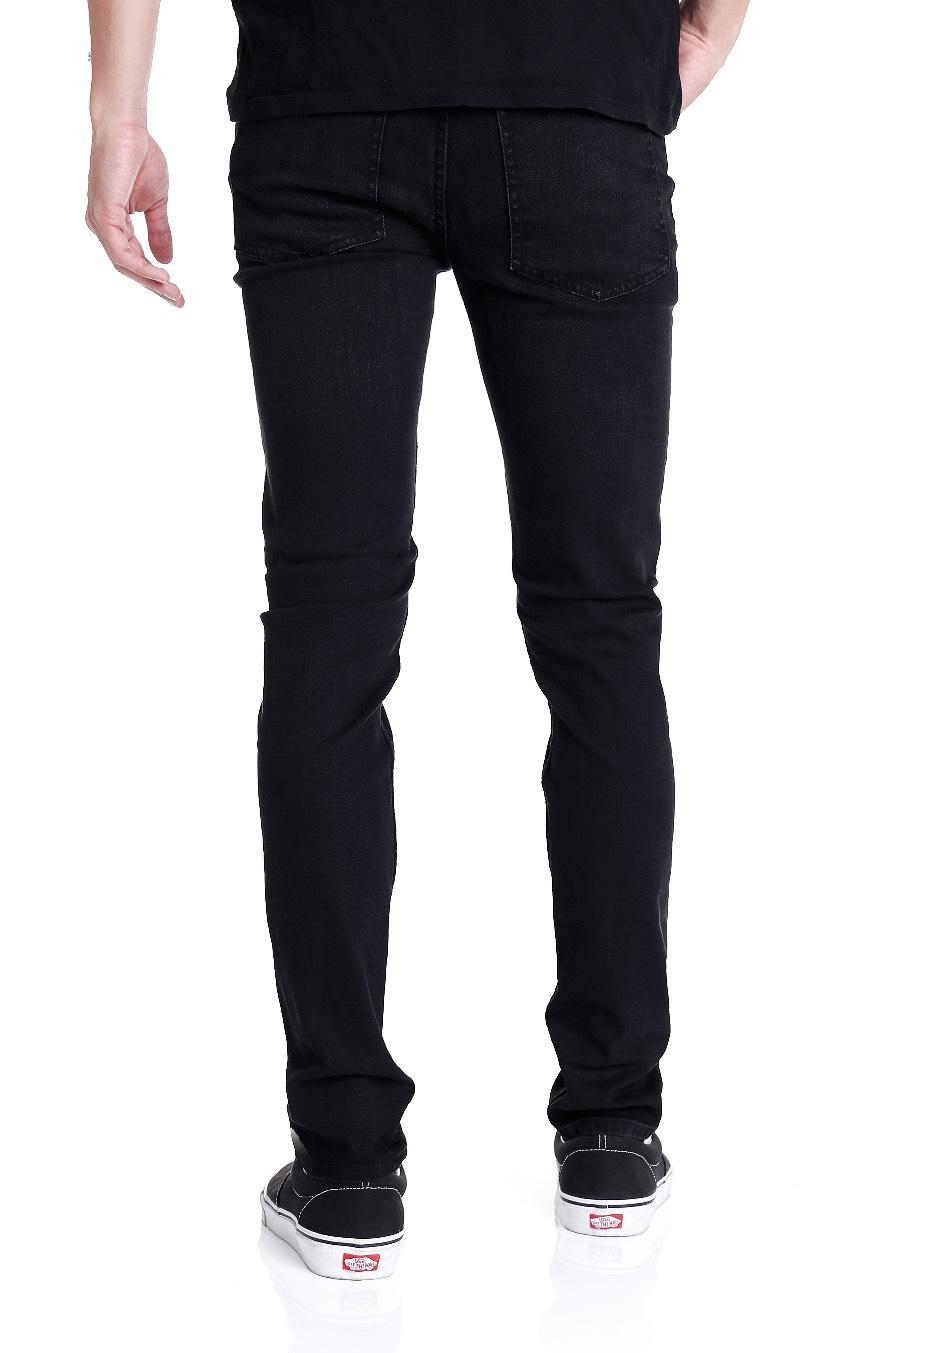 cheap monday tight black haze jeans nl. Black Bedroom Furniture Sets. Home Design Ideas